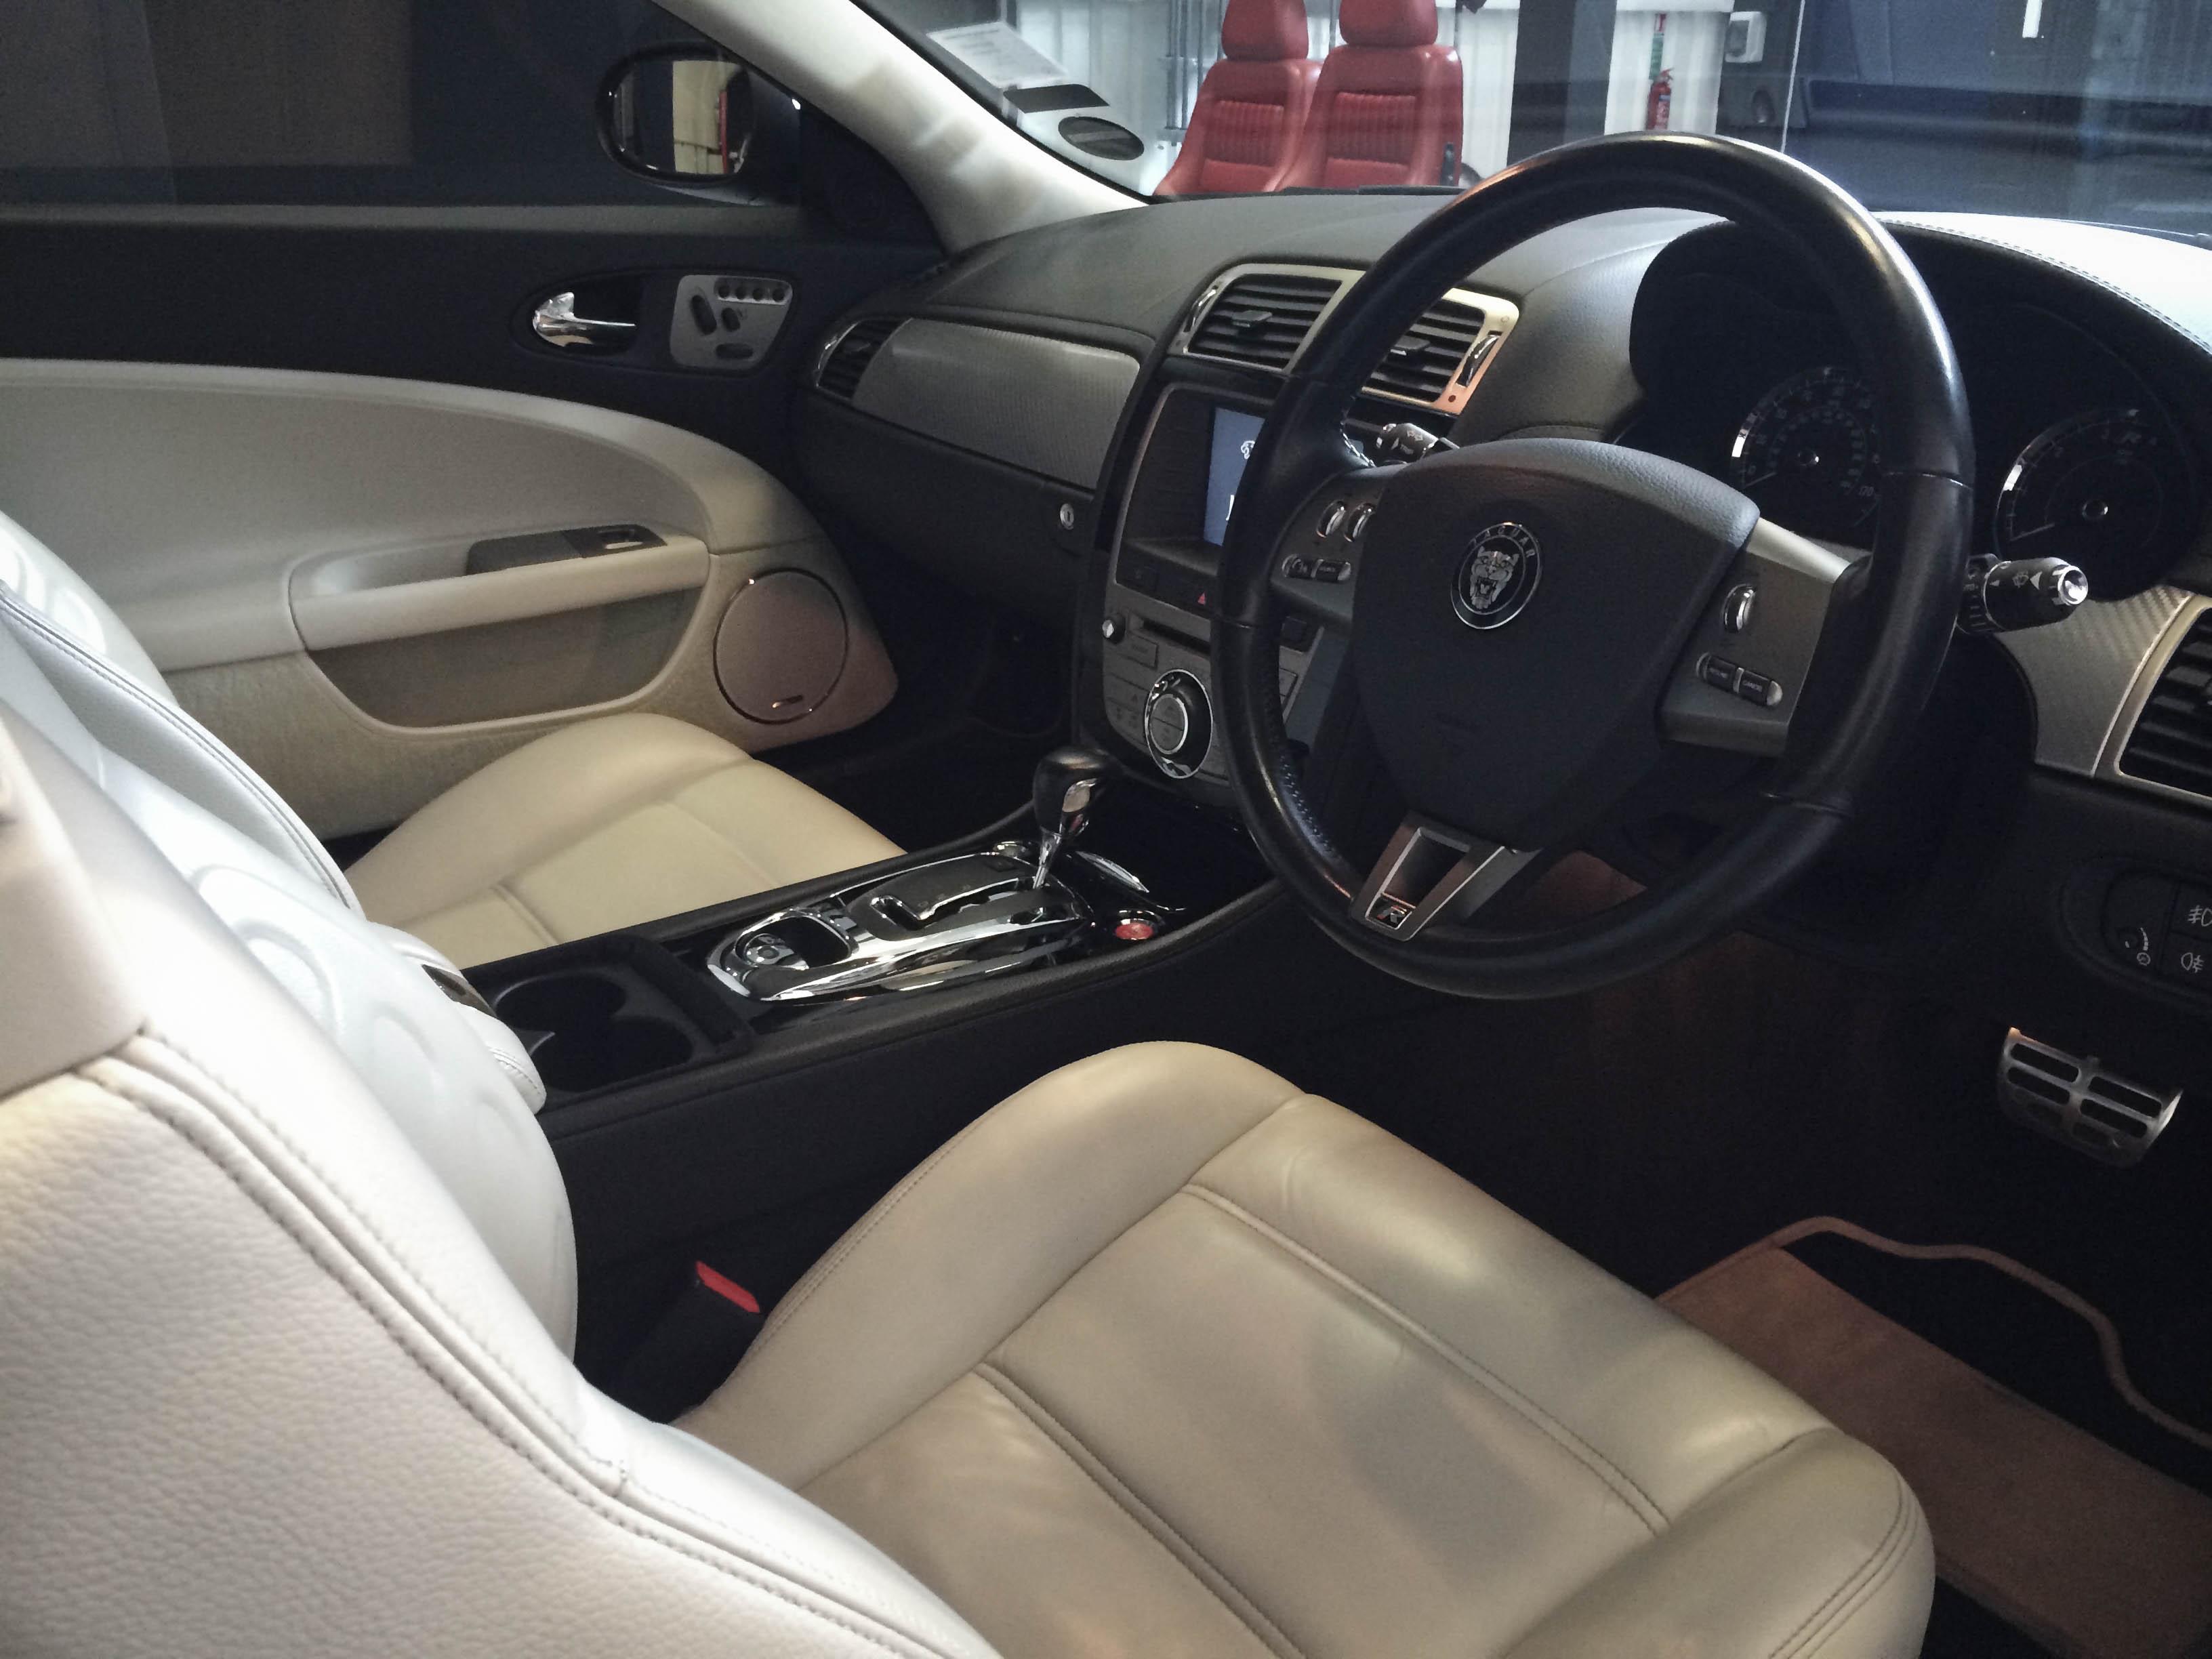 Jaguar R Coupe – Interior